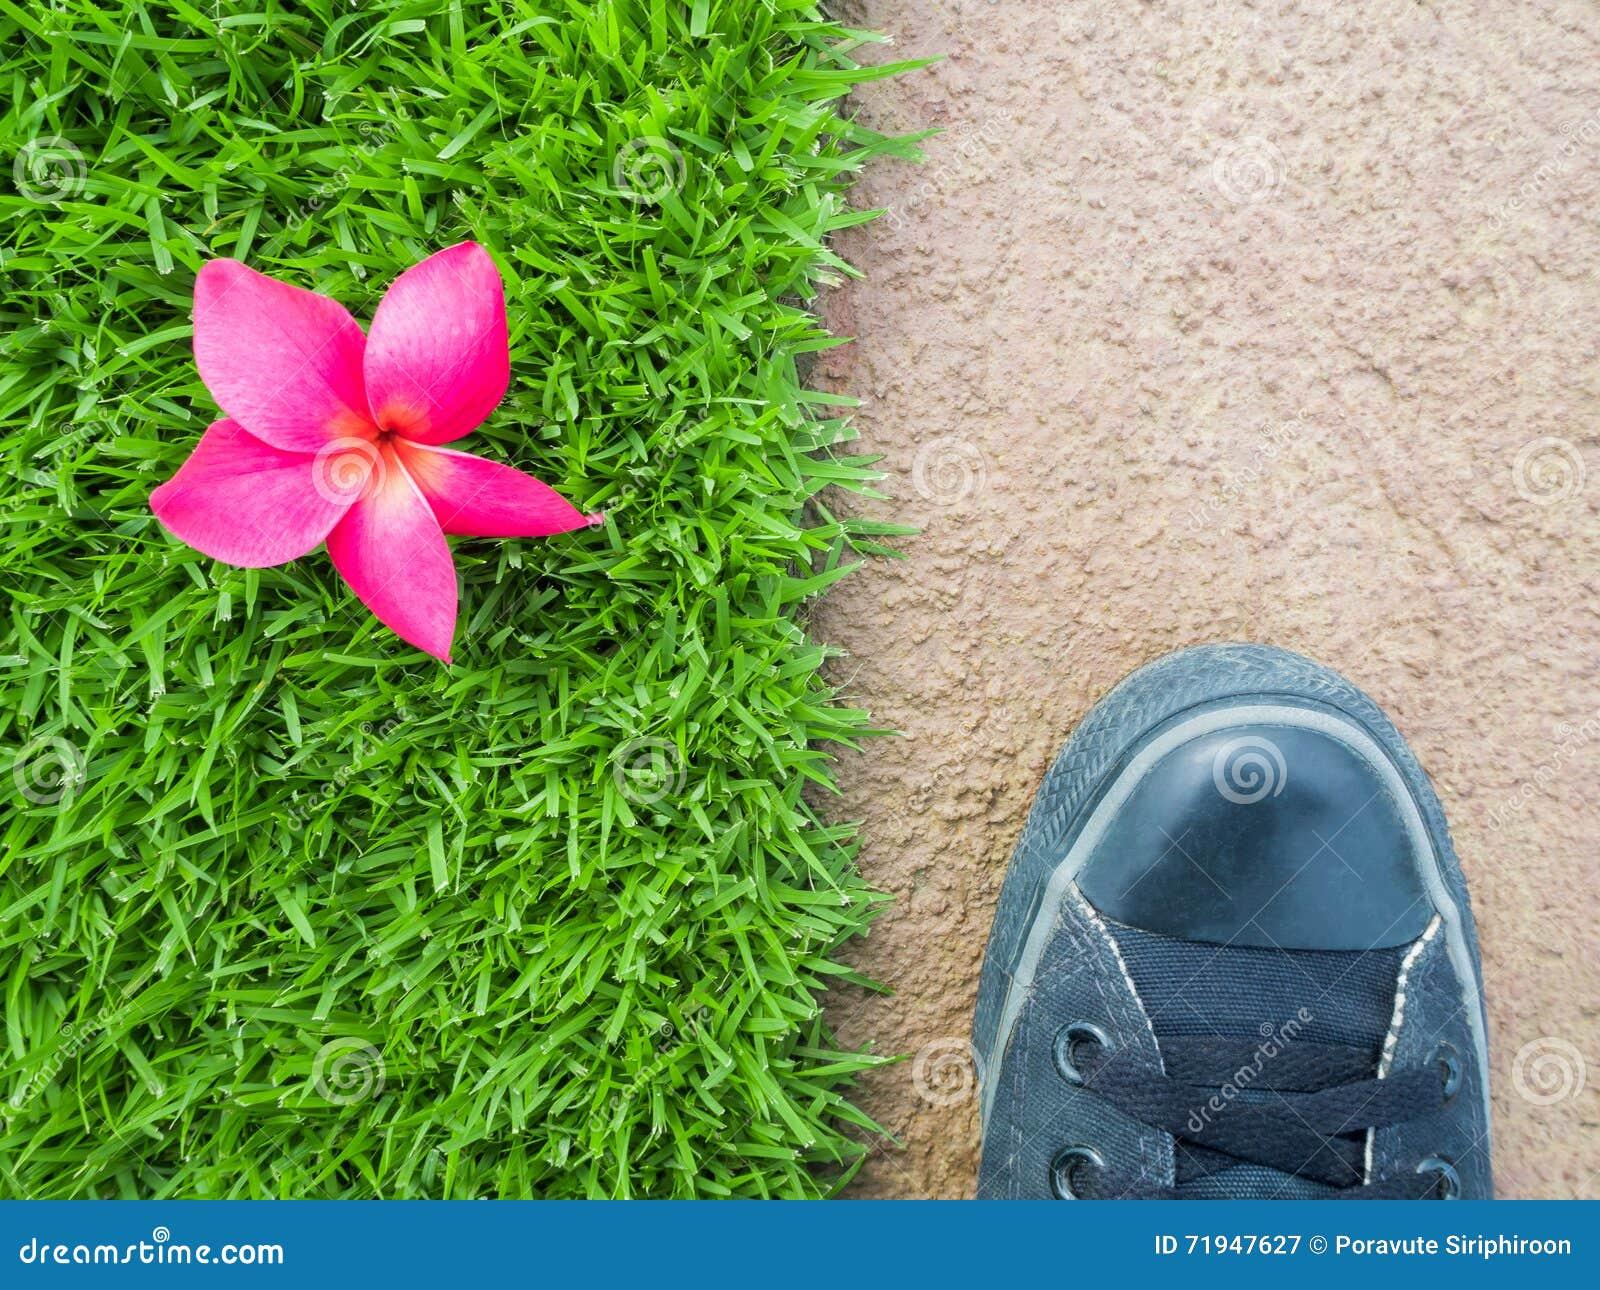 Ноги на поле между цветком на лужайке